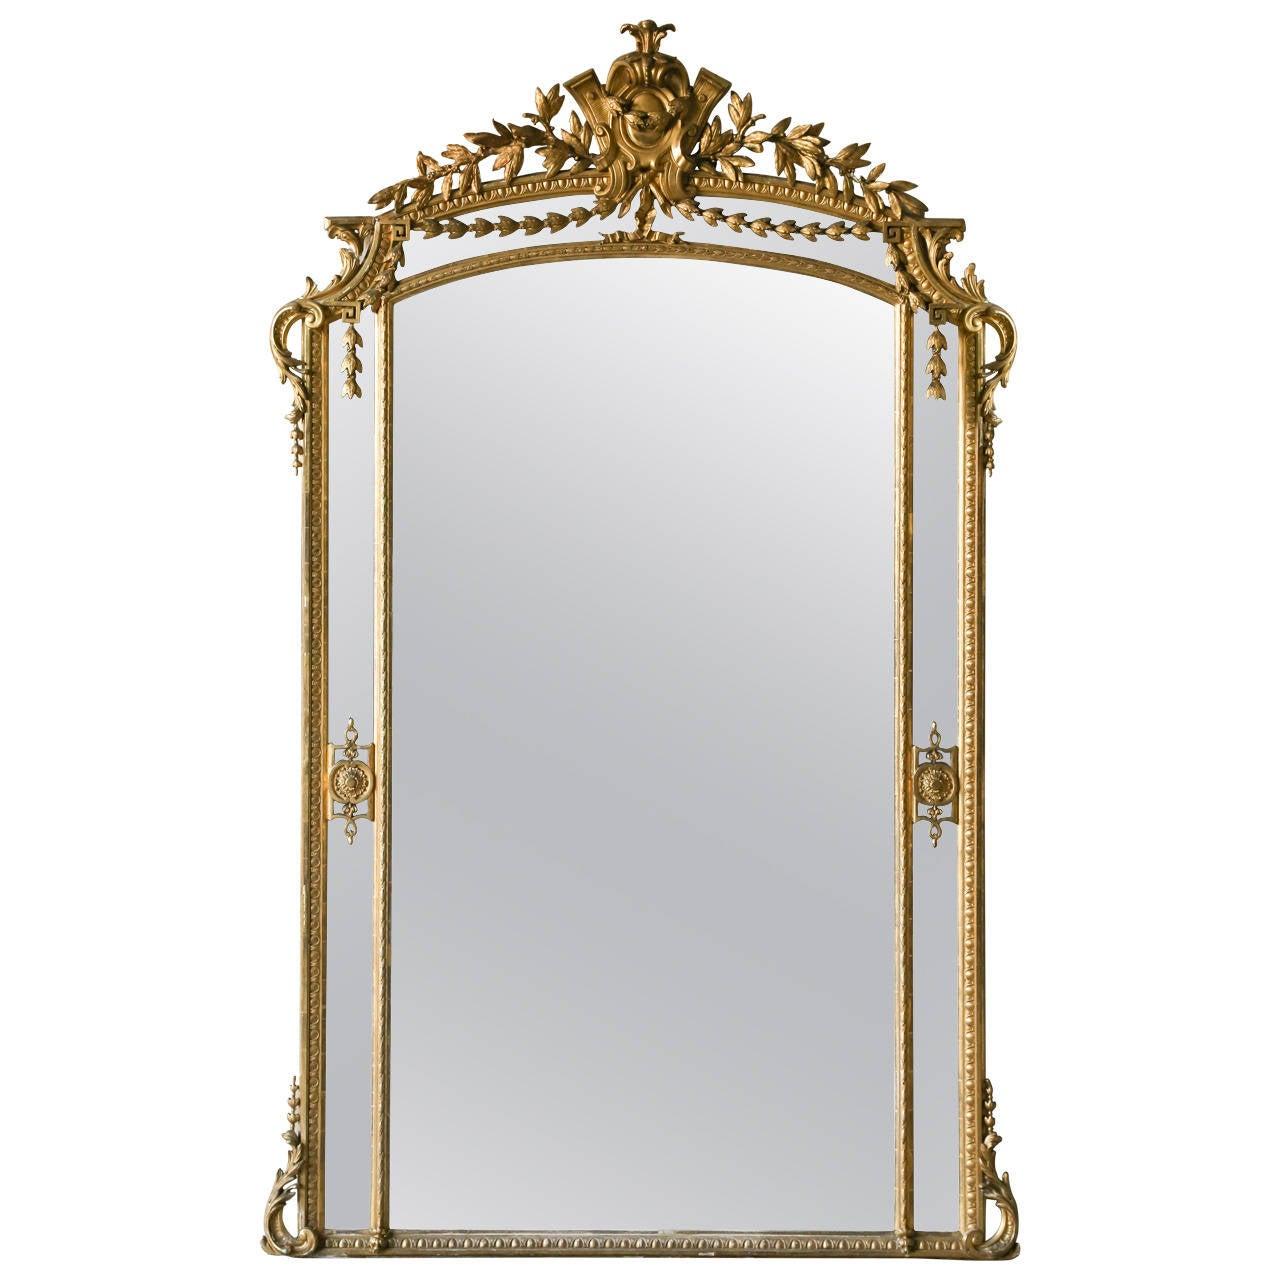 Arched gilt mirror at 1stdibs - Antique French Pareclose Ballroom Mirror Circa 1880 1